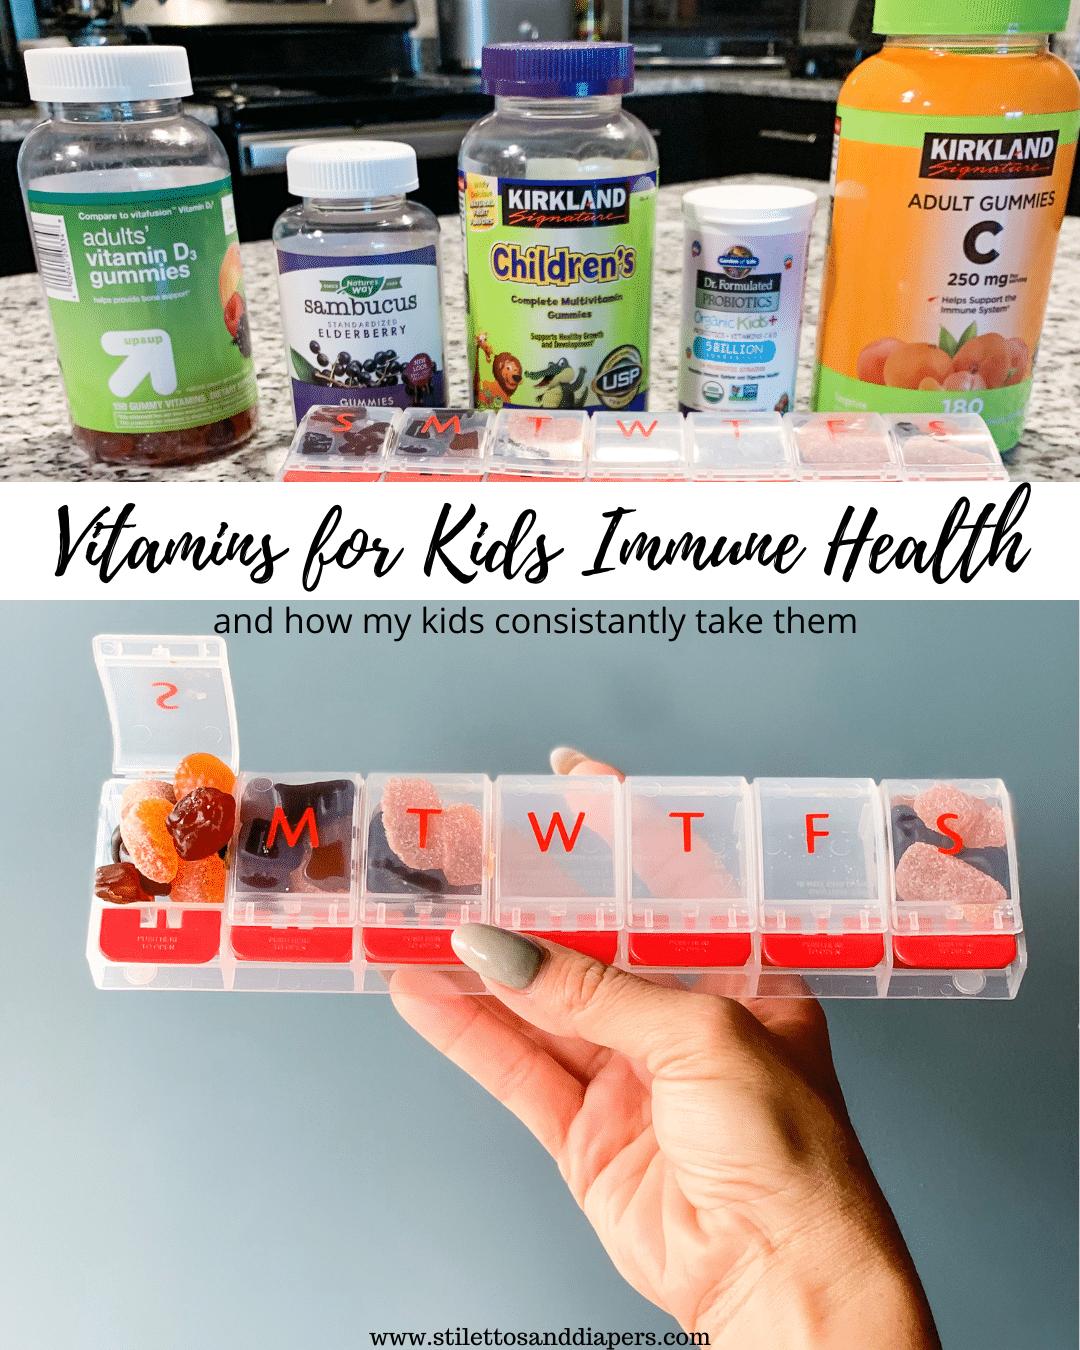 My Kids Daily Vitamins for Immune Health